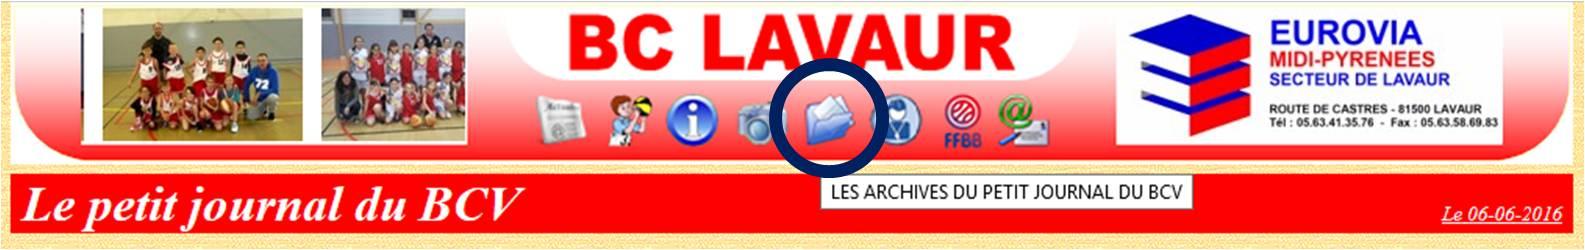 Archives du BC LAVAUR